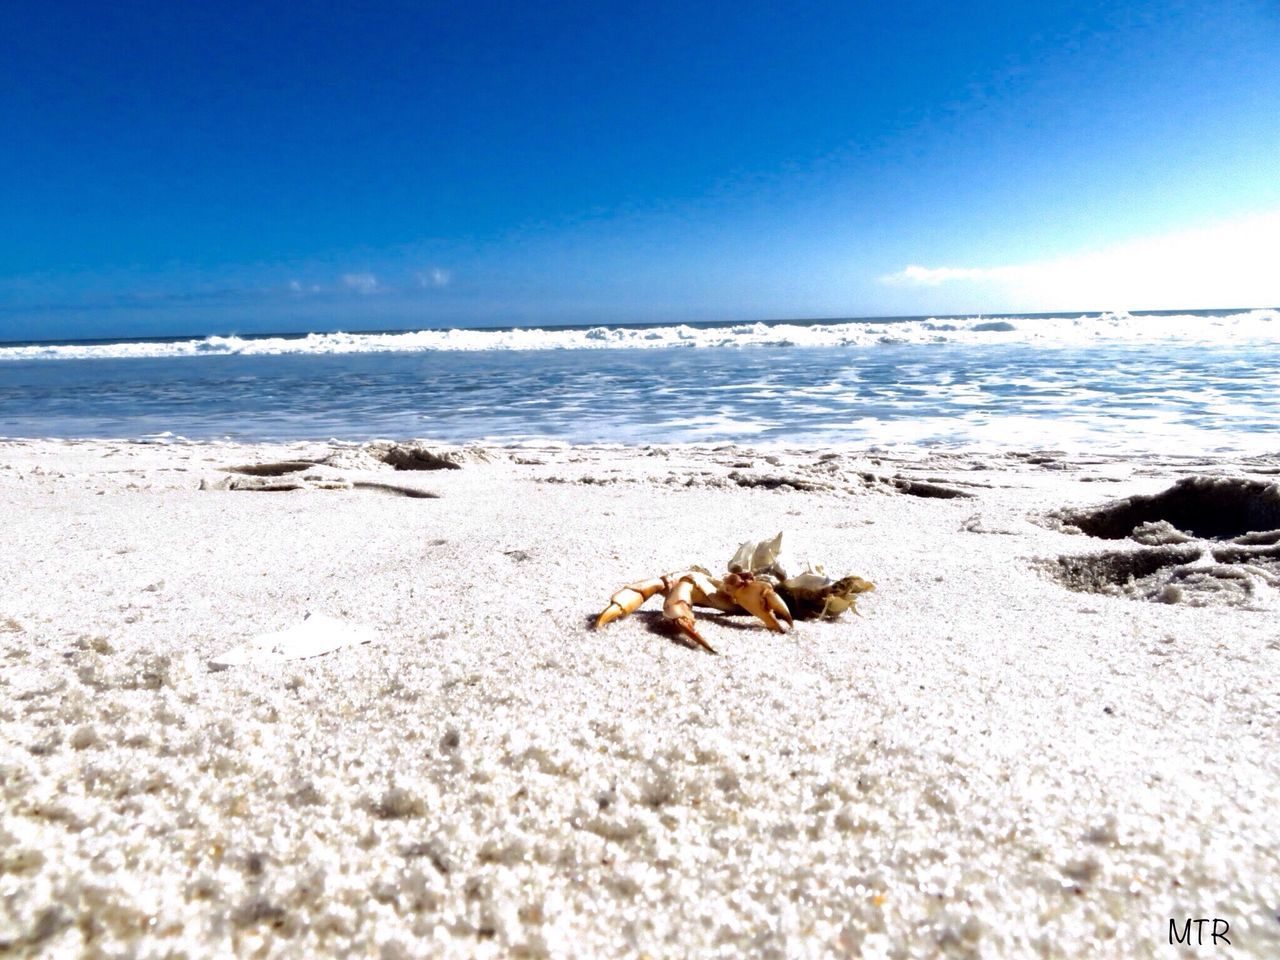 Sea Nature Beach No People Beauty In Nature Sunlight Scenics Tranquility Sky Sand Outdoors Water Summer's Coming Smithpoint Beach Shore SouthShore Beach LongIslandNY Fireislandnationalseashore